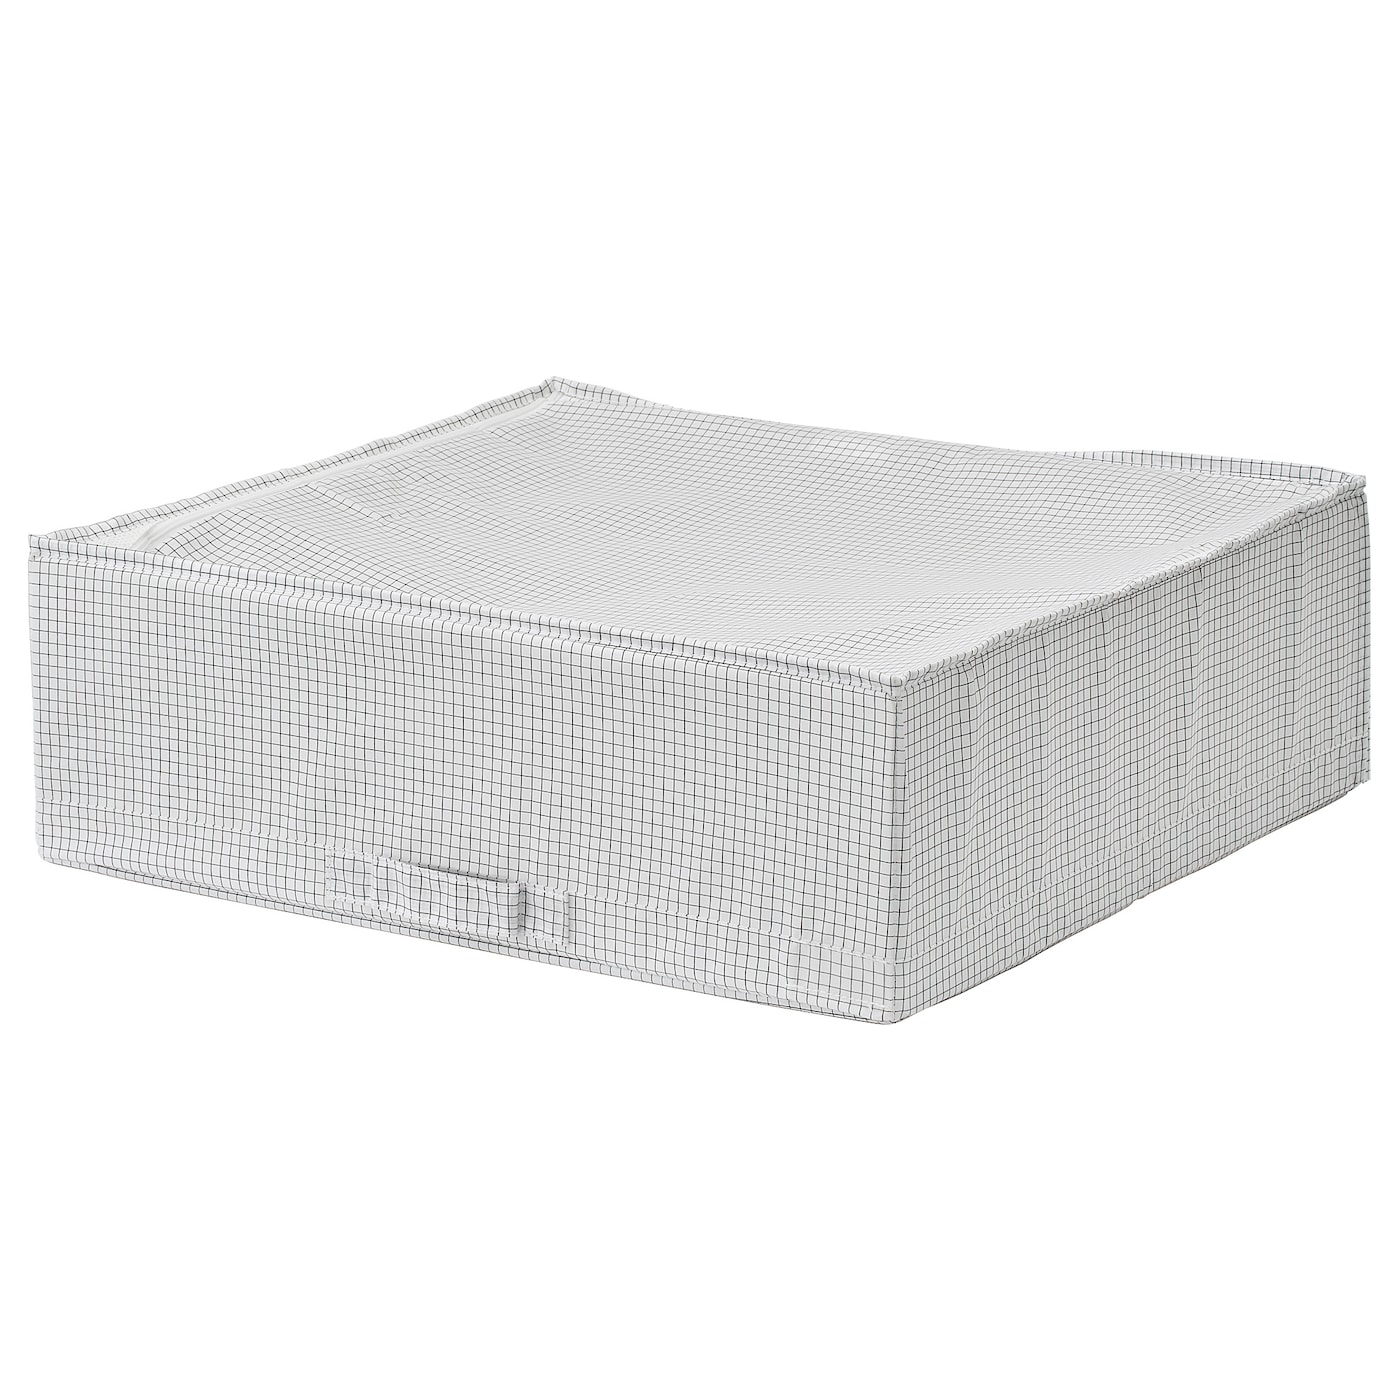 IKEA STUK Tasche - 55 x 51 x 18 cm